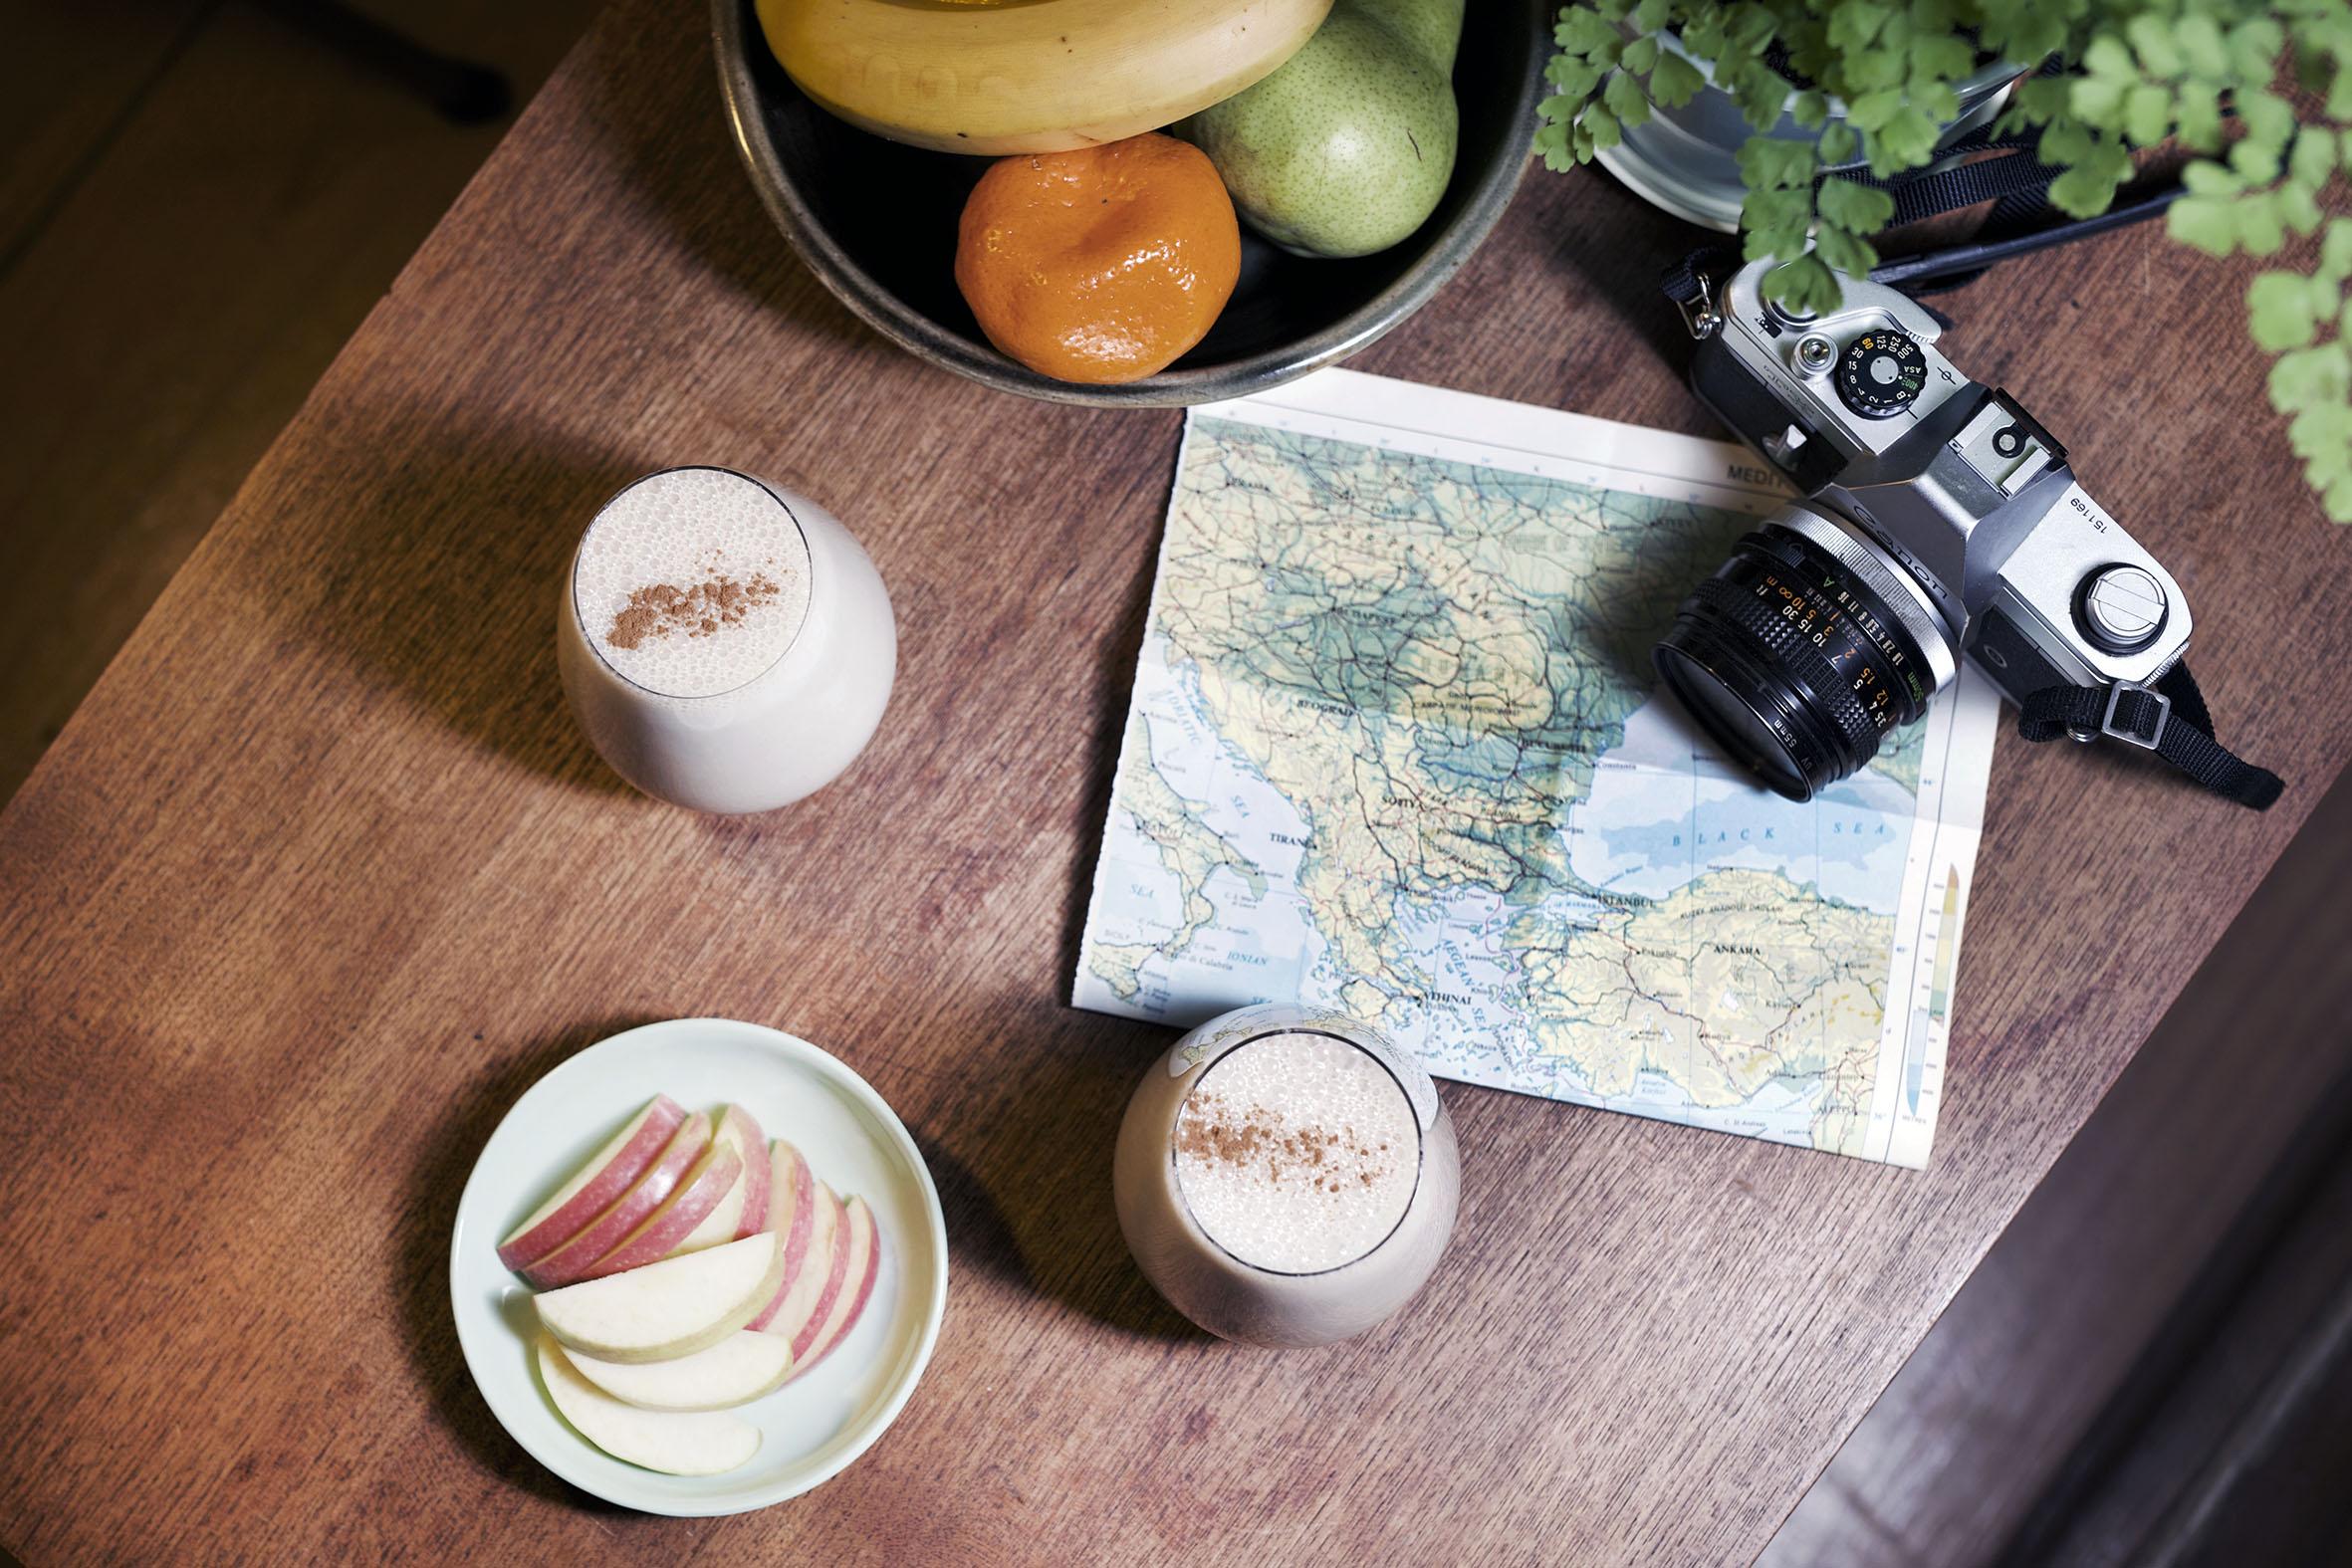 Oliver and york prana chai map.jpg